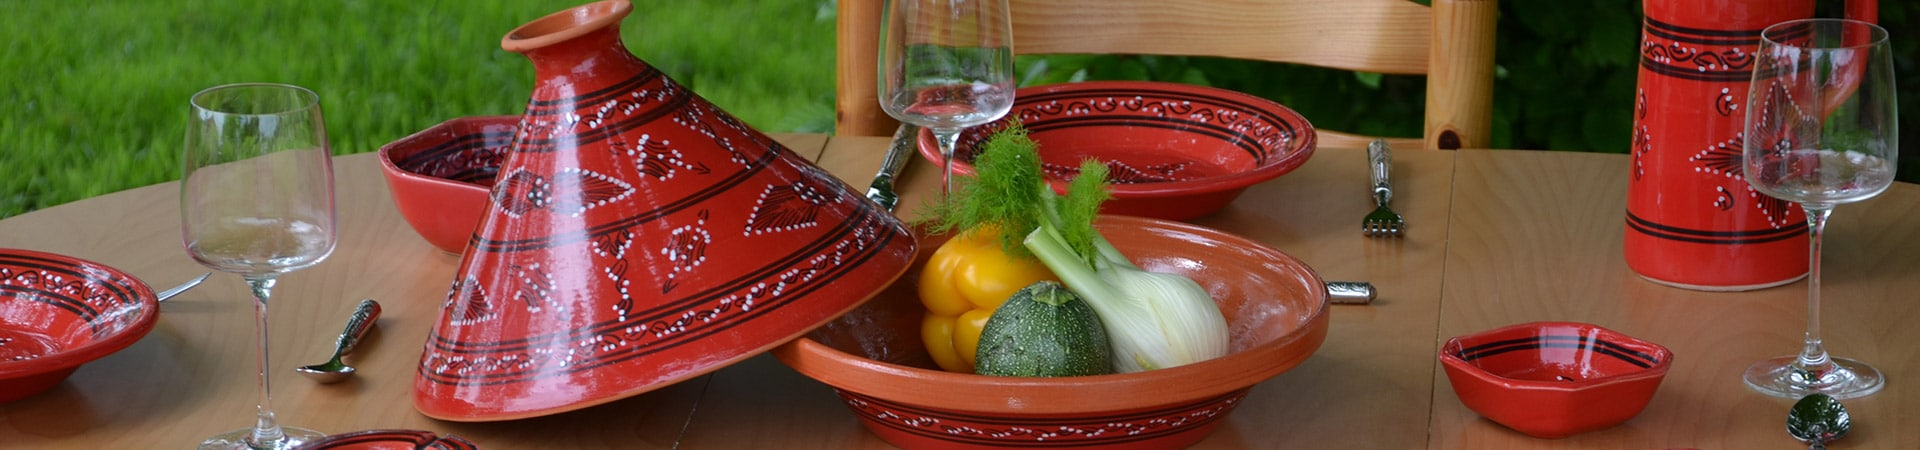 grossiste vaisselle orientale poterie france